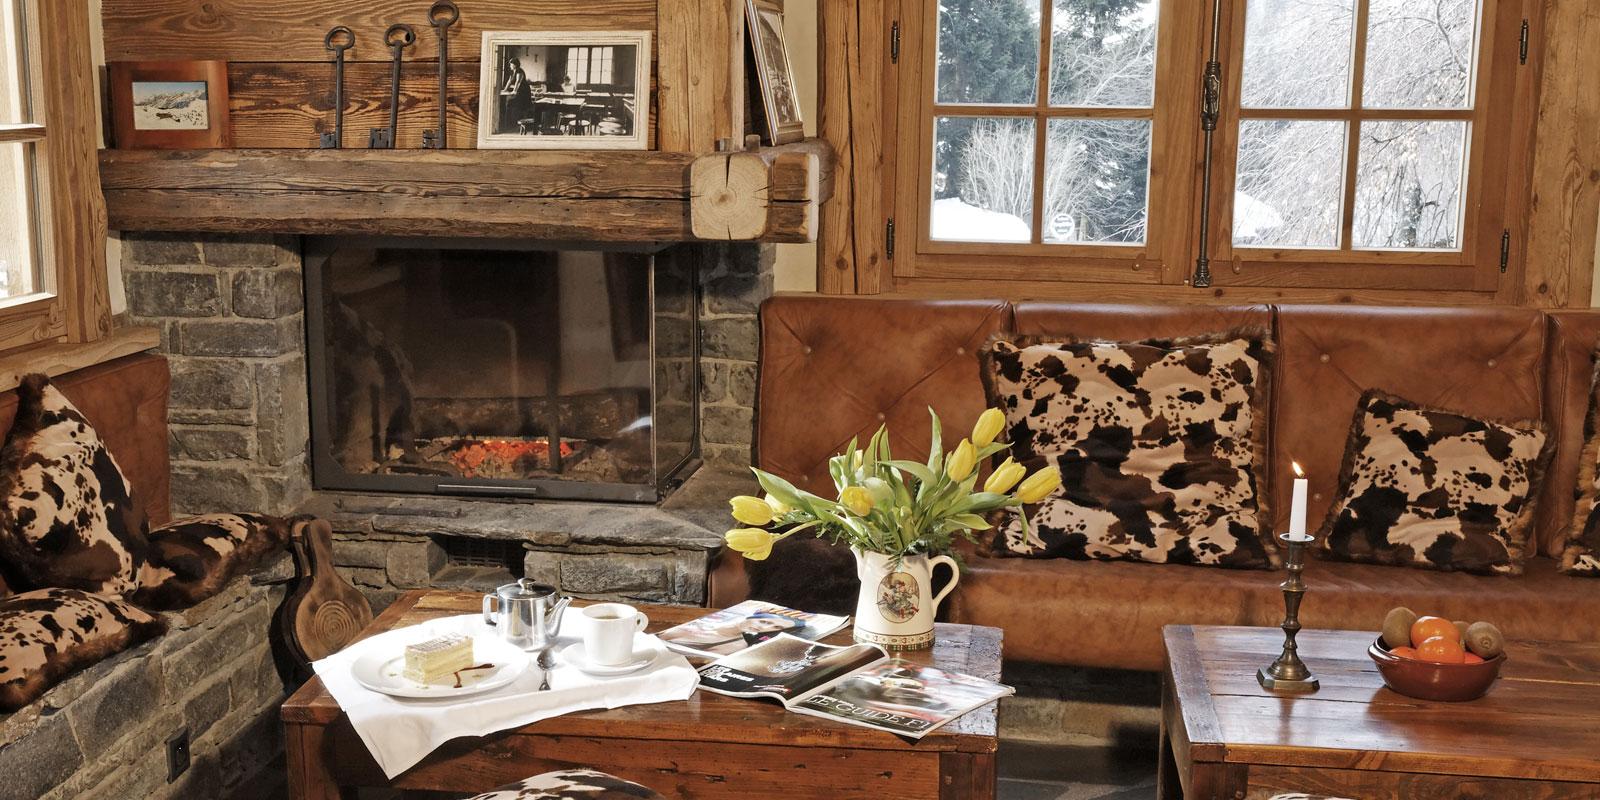 interieur chalet bois savoyard cool deco interieur chalet best deco interieur chalet images. Black Bedroom Furniture Sets. Home Design Ideas